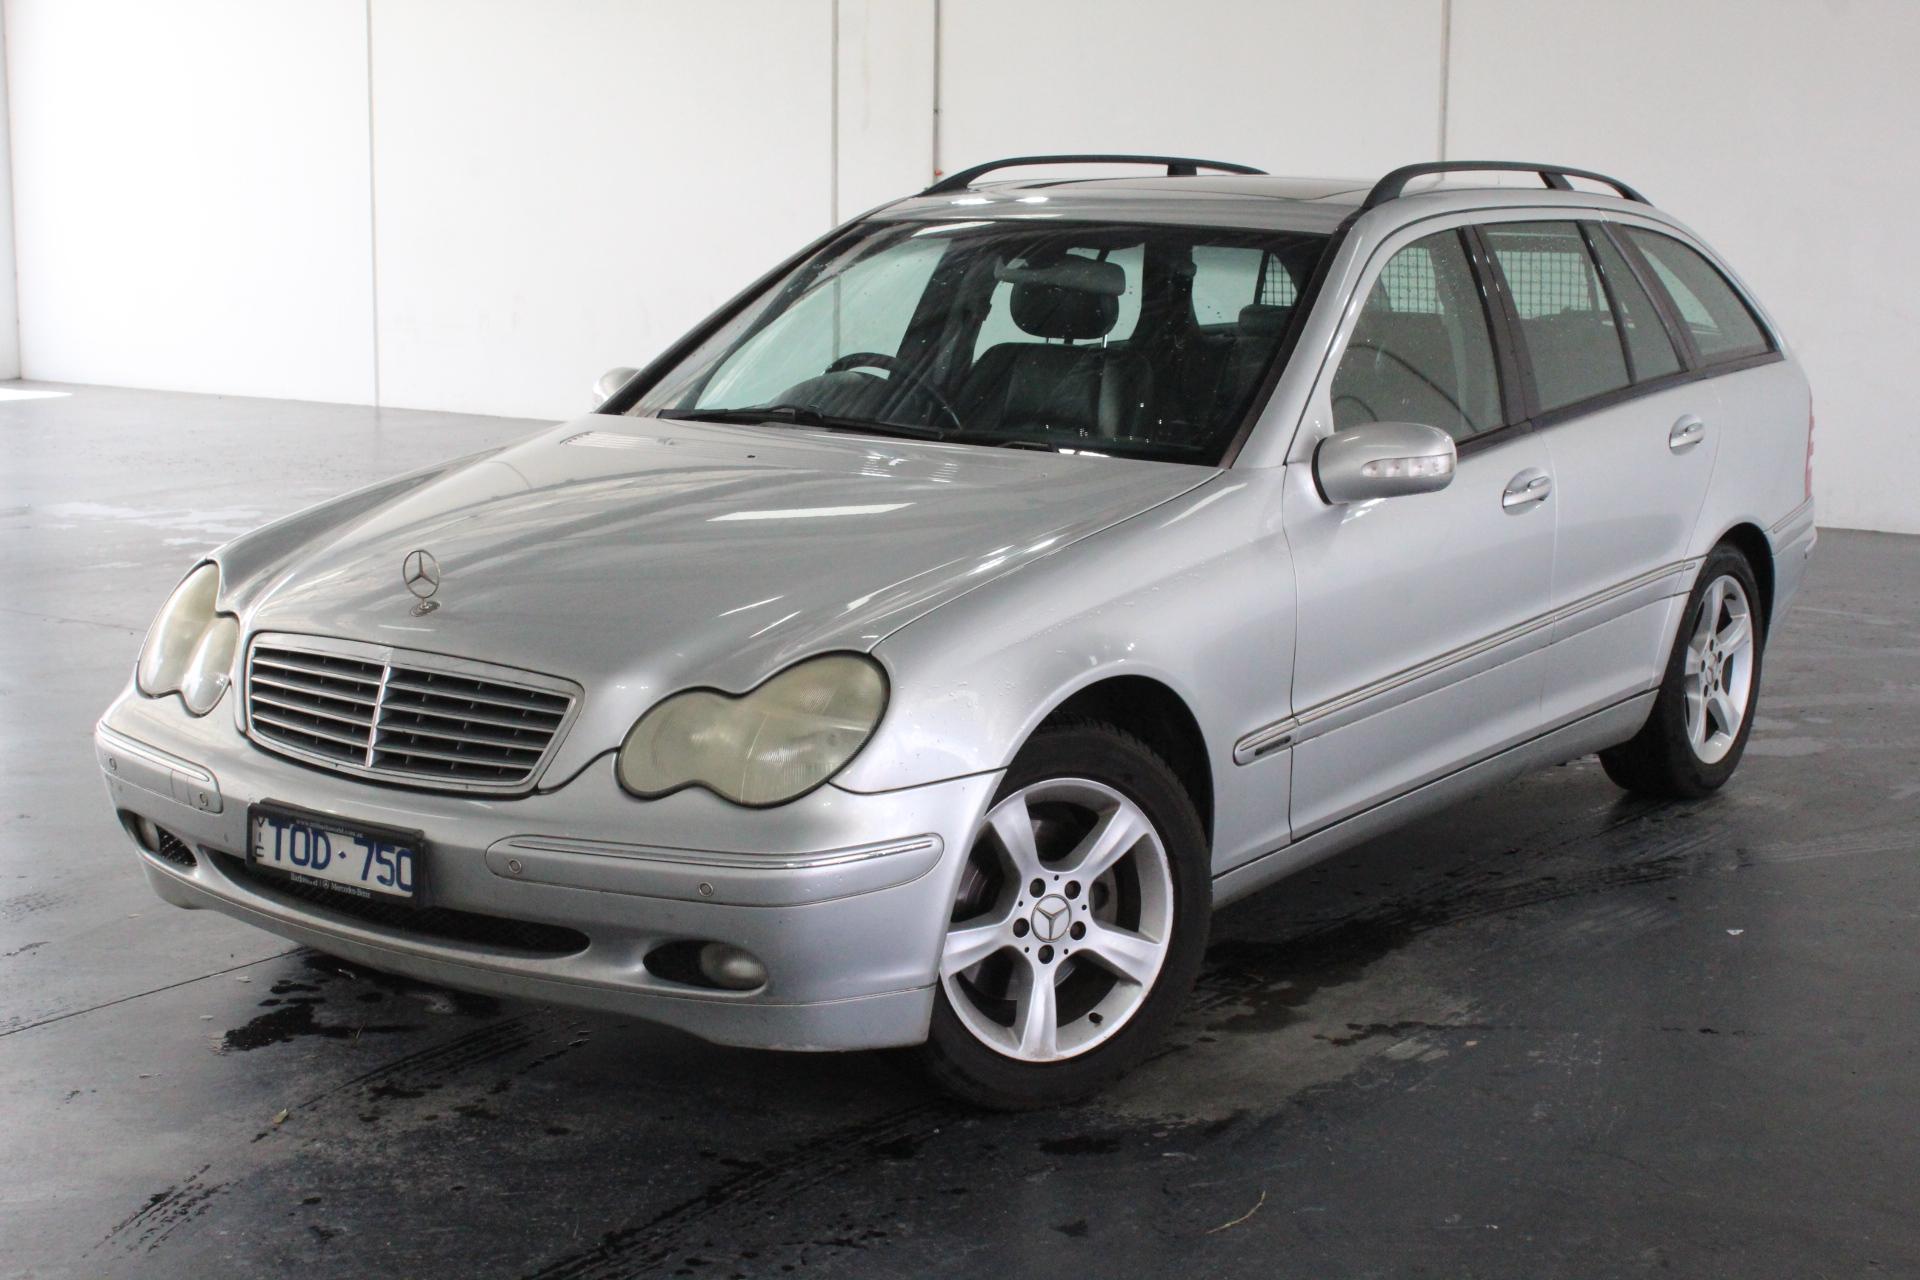 2001 Mercedes Benz C200 Elegance S203 Automatic Wagon